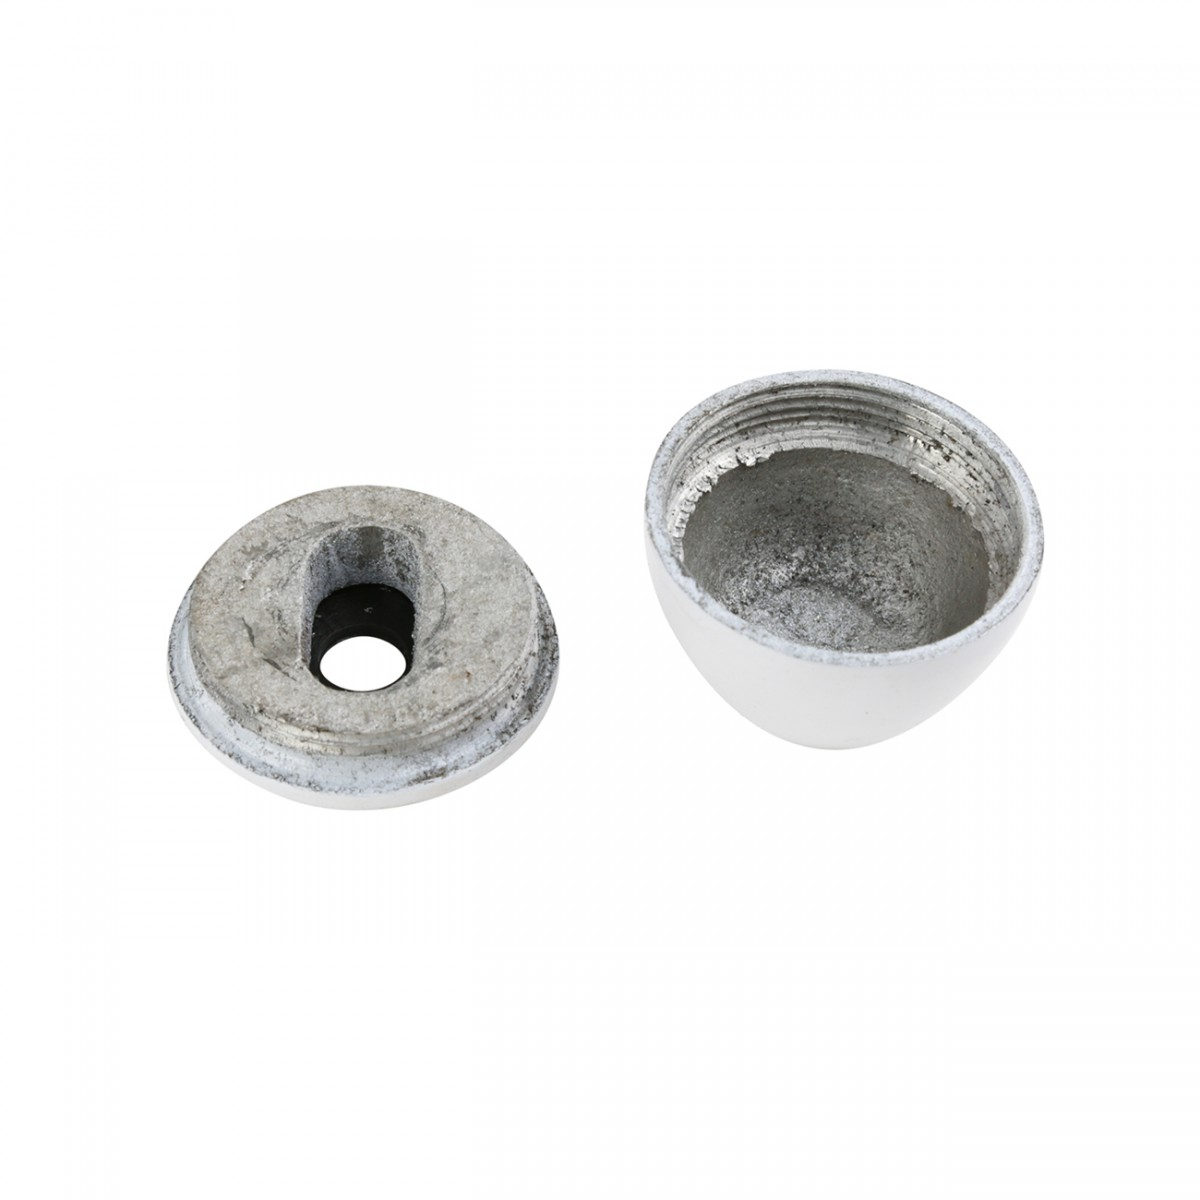 Rustproof Aluminum Toilet Bolt Covers  White  Set of 2 Bolt Cover Toilet Bolt Cover Toilet Bolt Cap